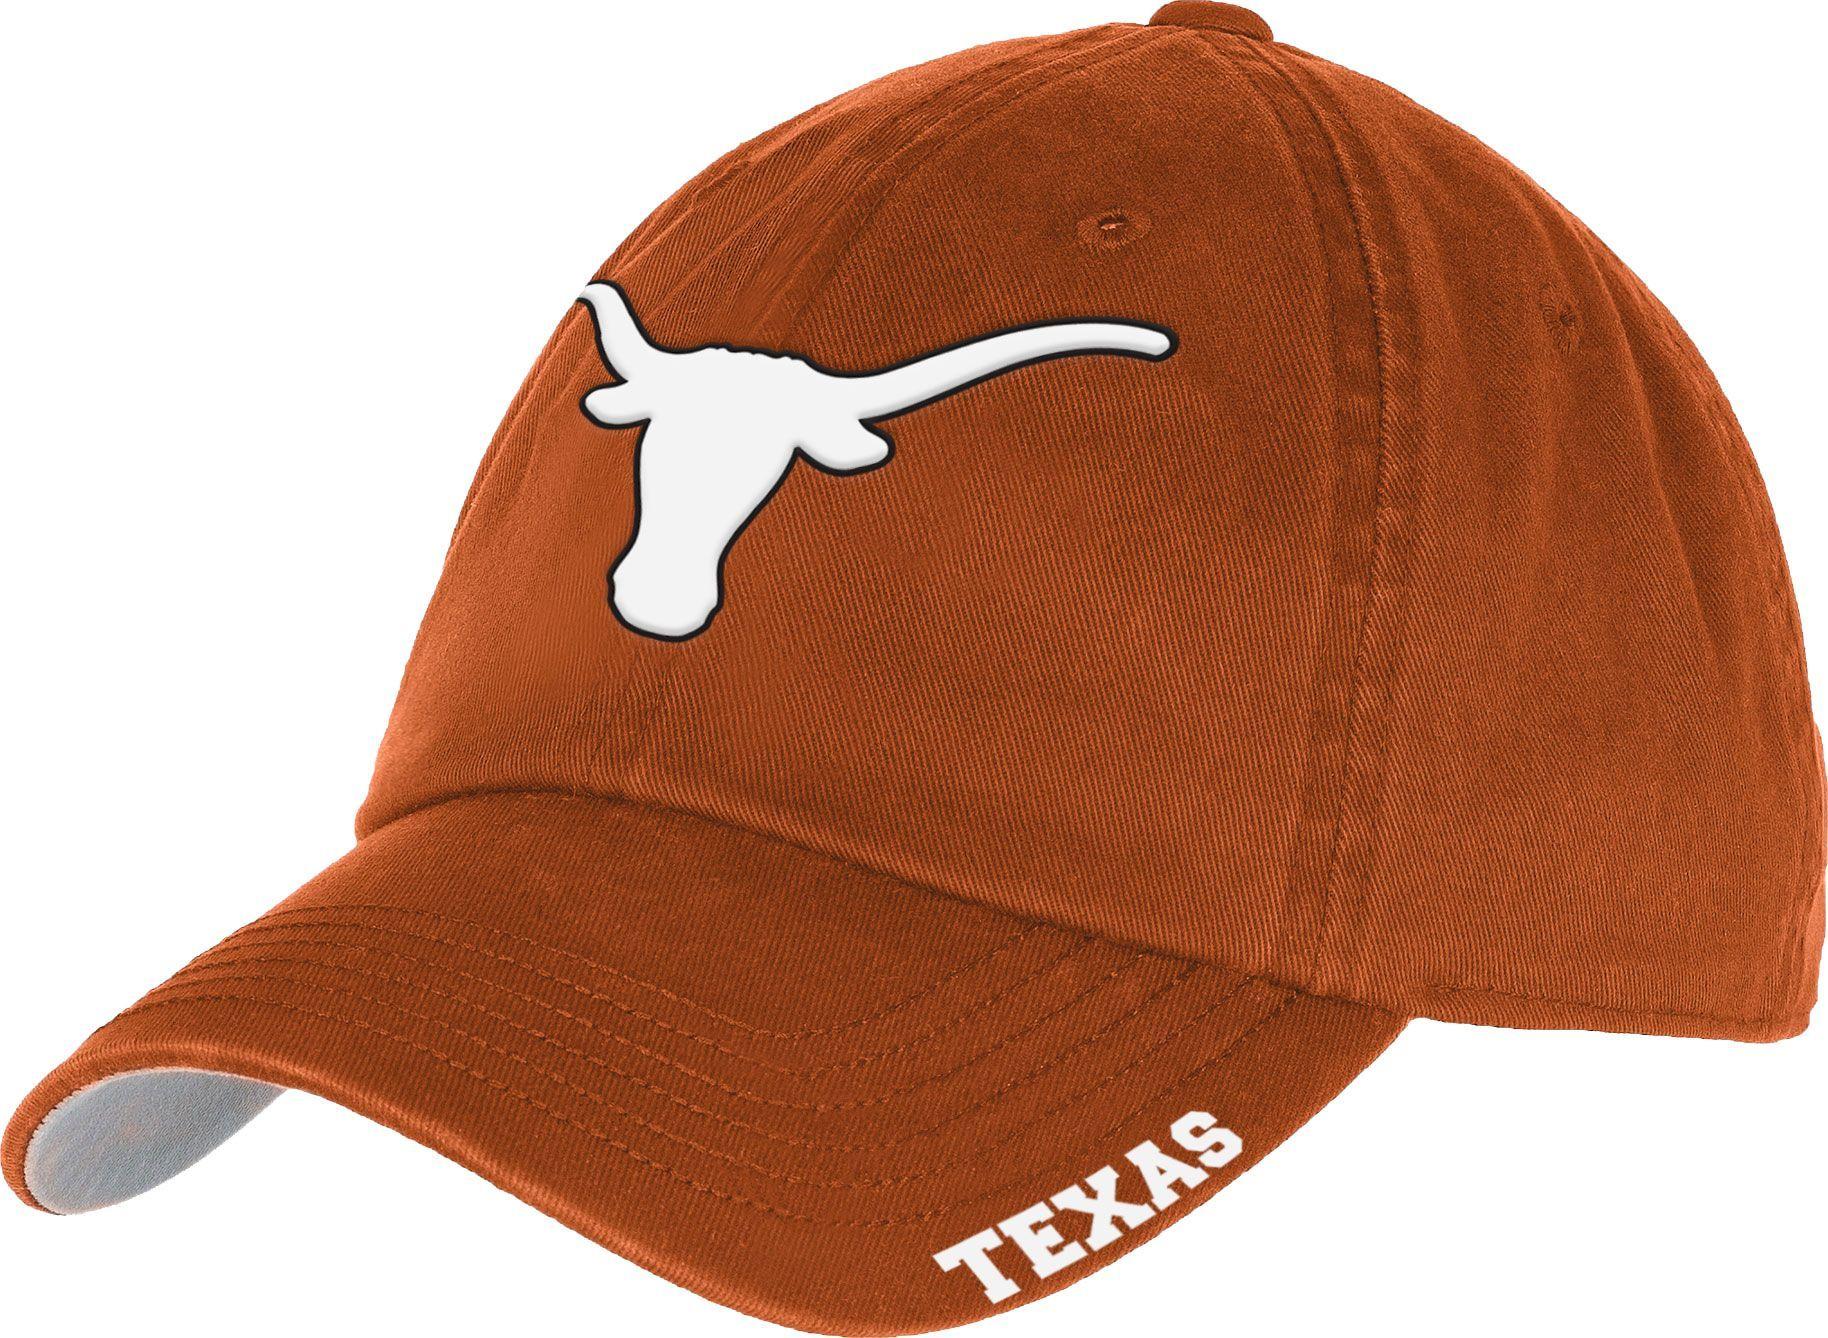 check out 6a356 66184 Antigua Texas Longhorns Mens Burnt Orange Diamond Era 39THIRTY Flex Hat -  41020832 in 2019   Products   Texas longhorns hat, Hats, Texas longhorns t  shirts